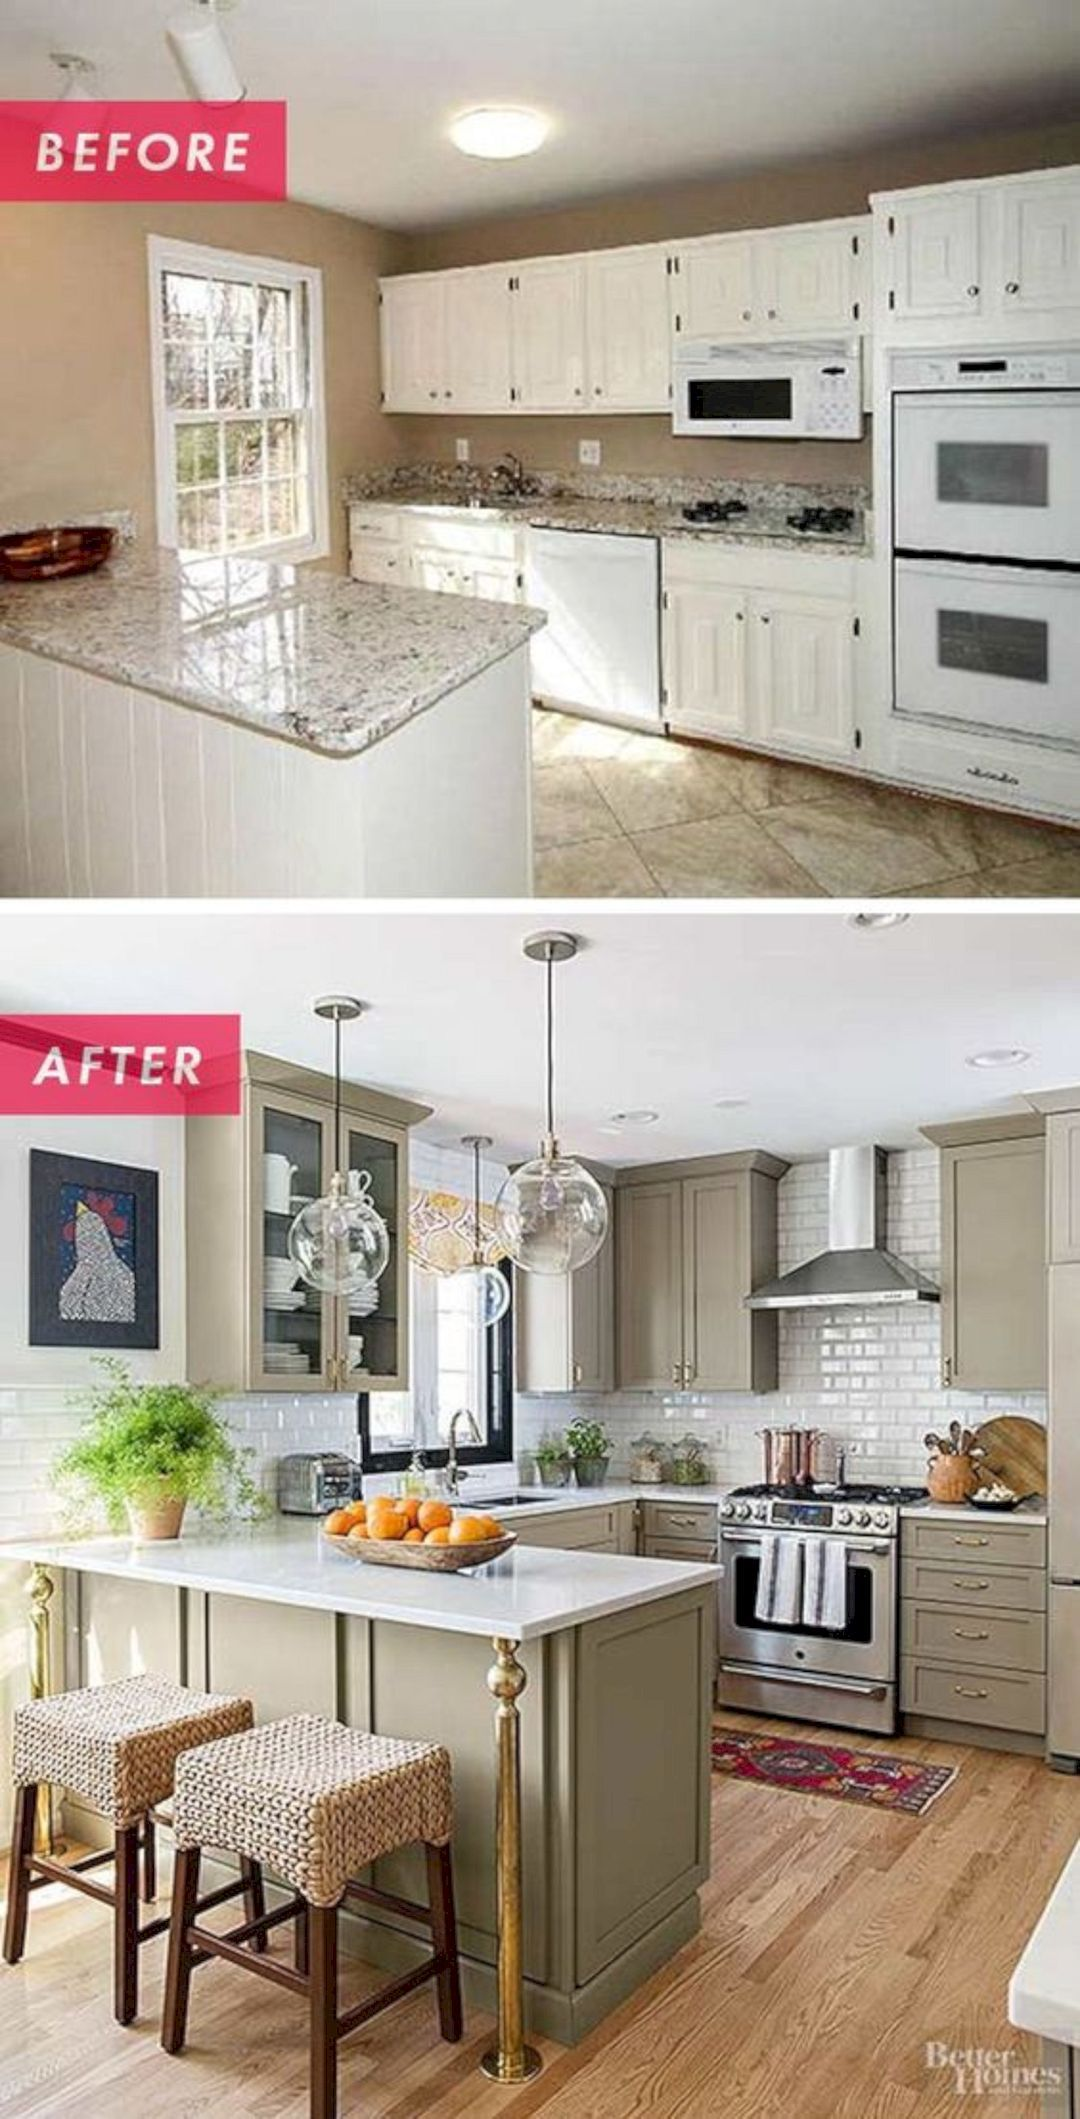 Stunning Before After Diy Kitchen Remodel For Under 500